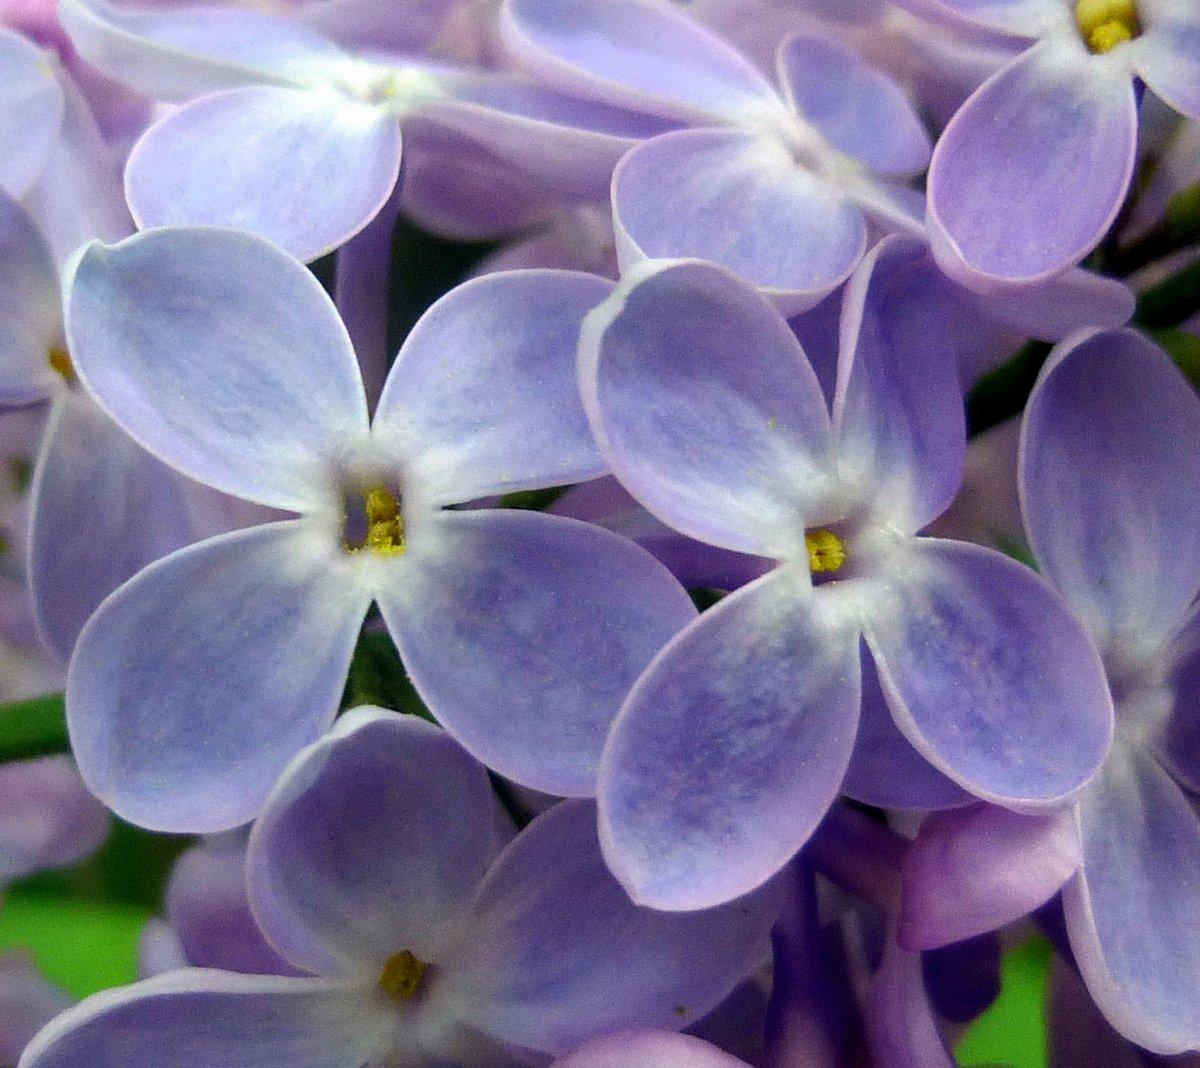 13. Lilac